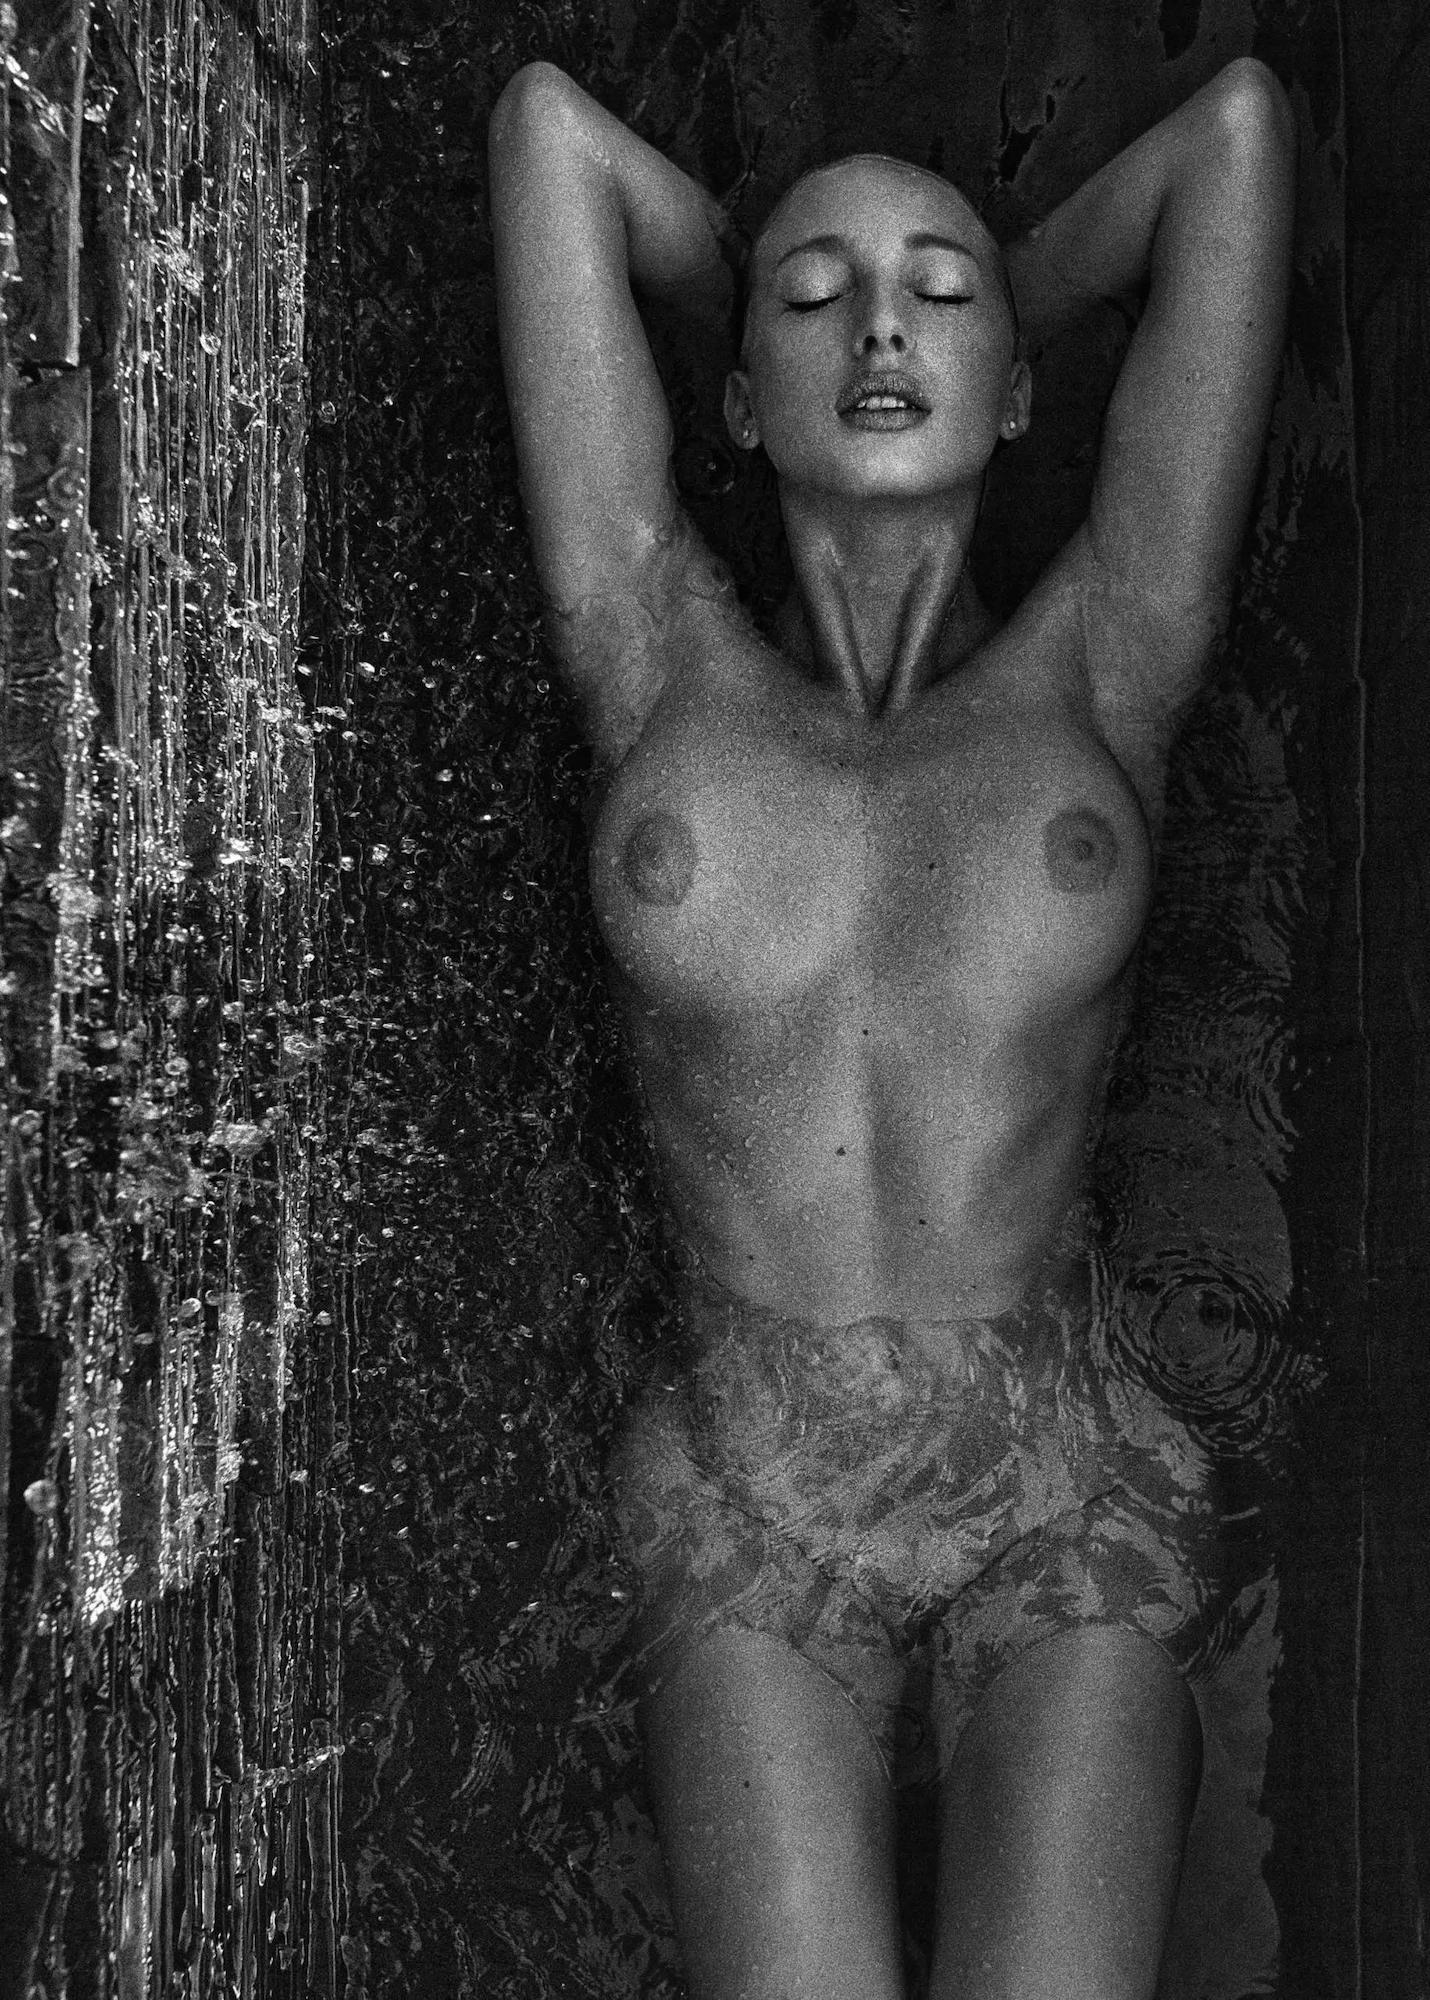 Alana Marie by Steven Lyon